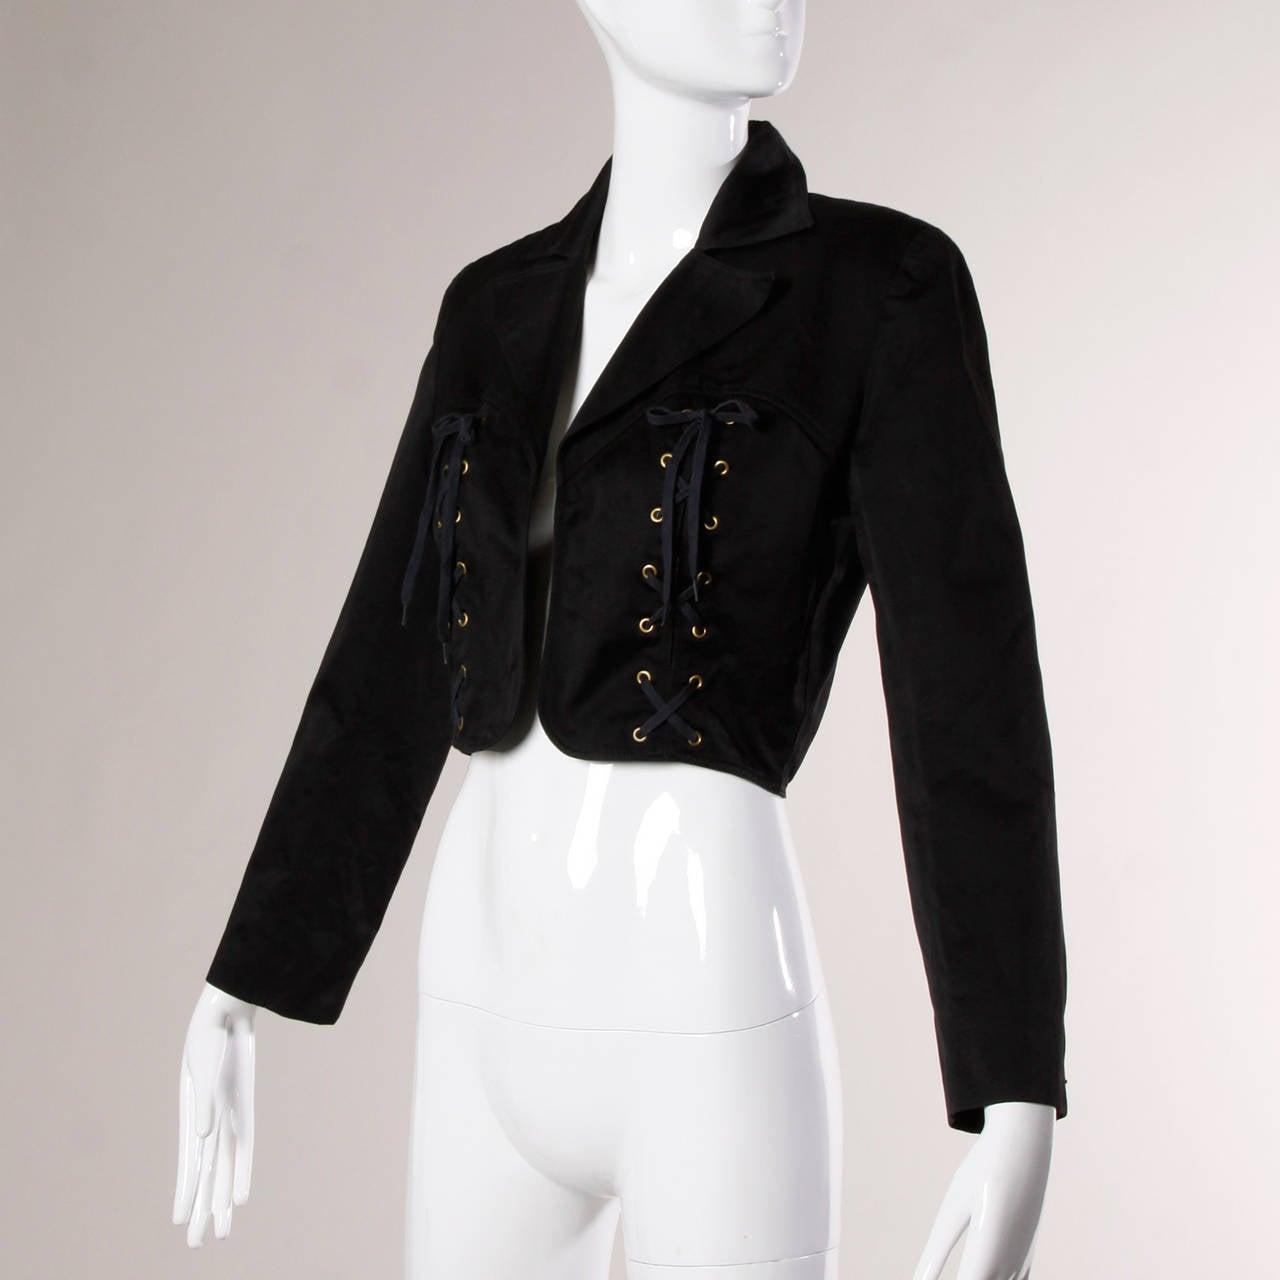 Patrick Kelly Vintage Black Lace Up Grommet Jacket 3